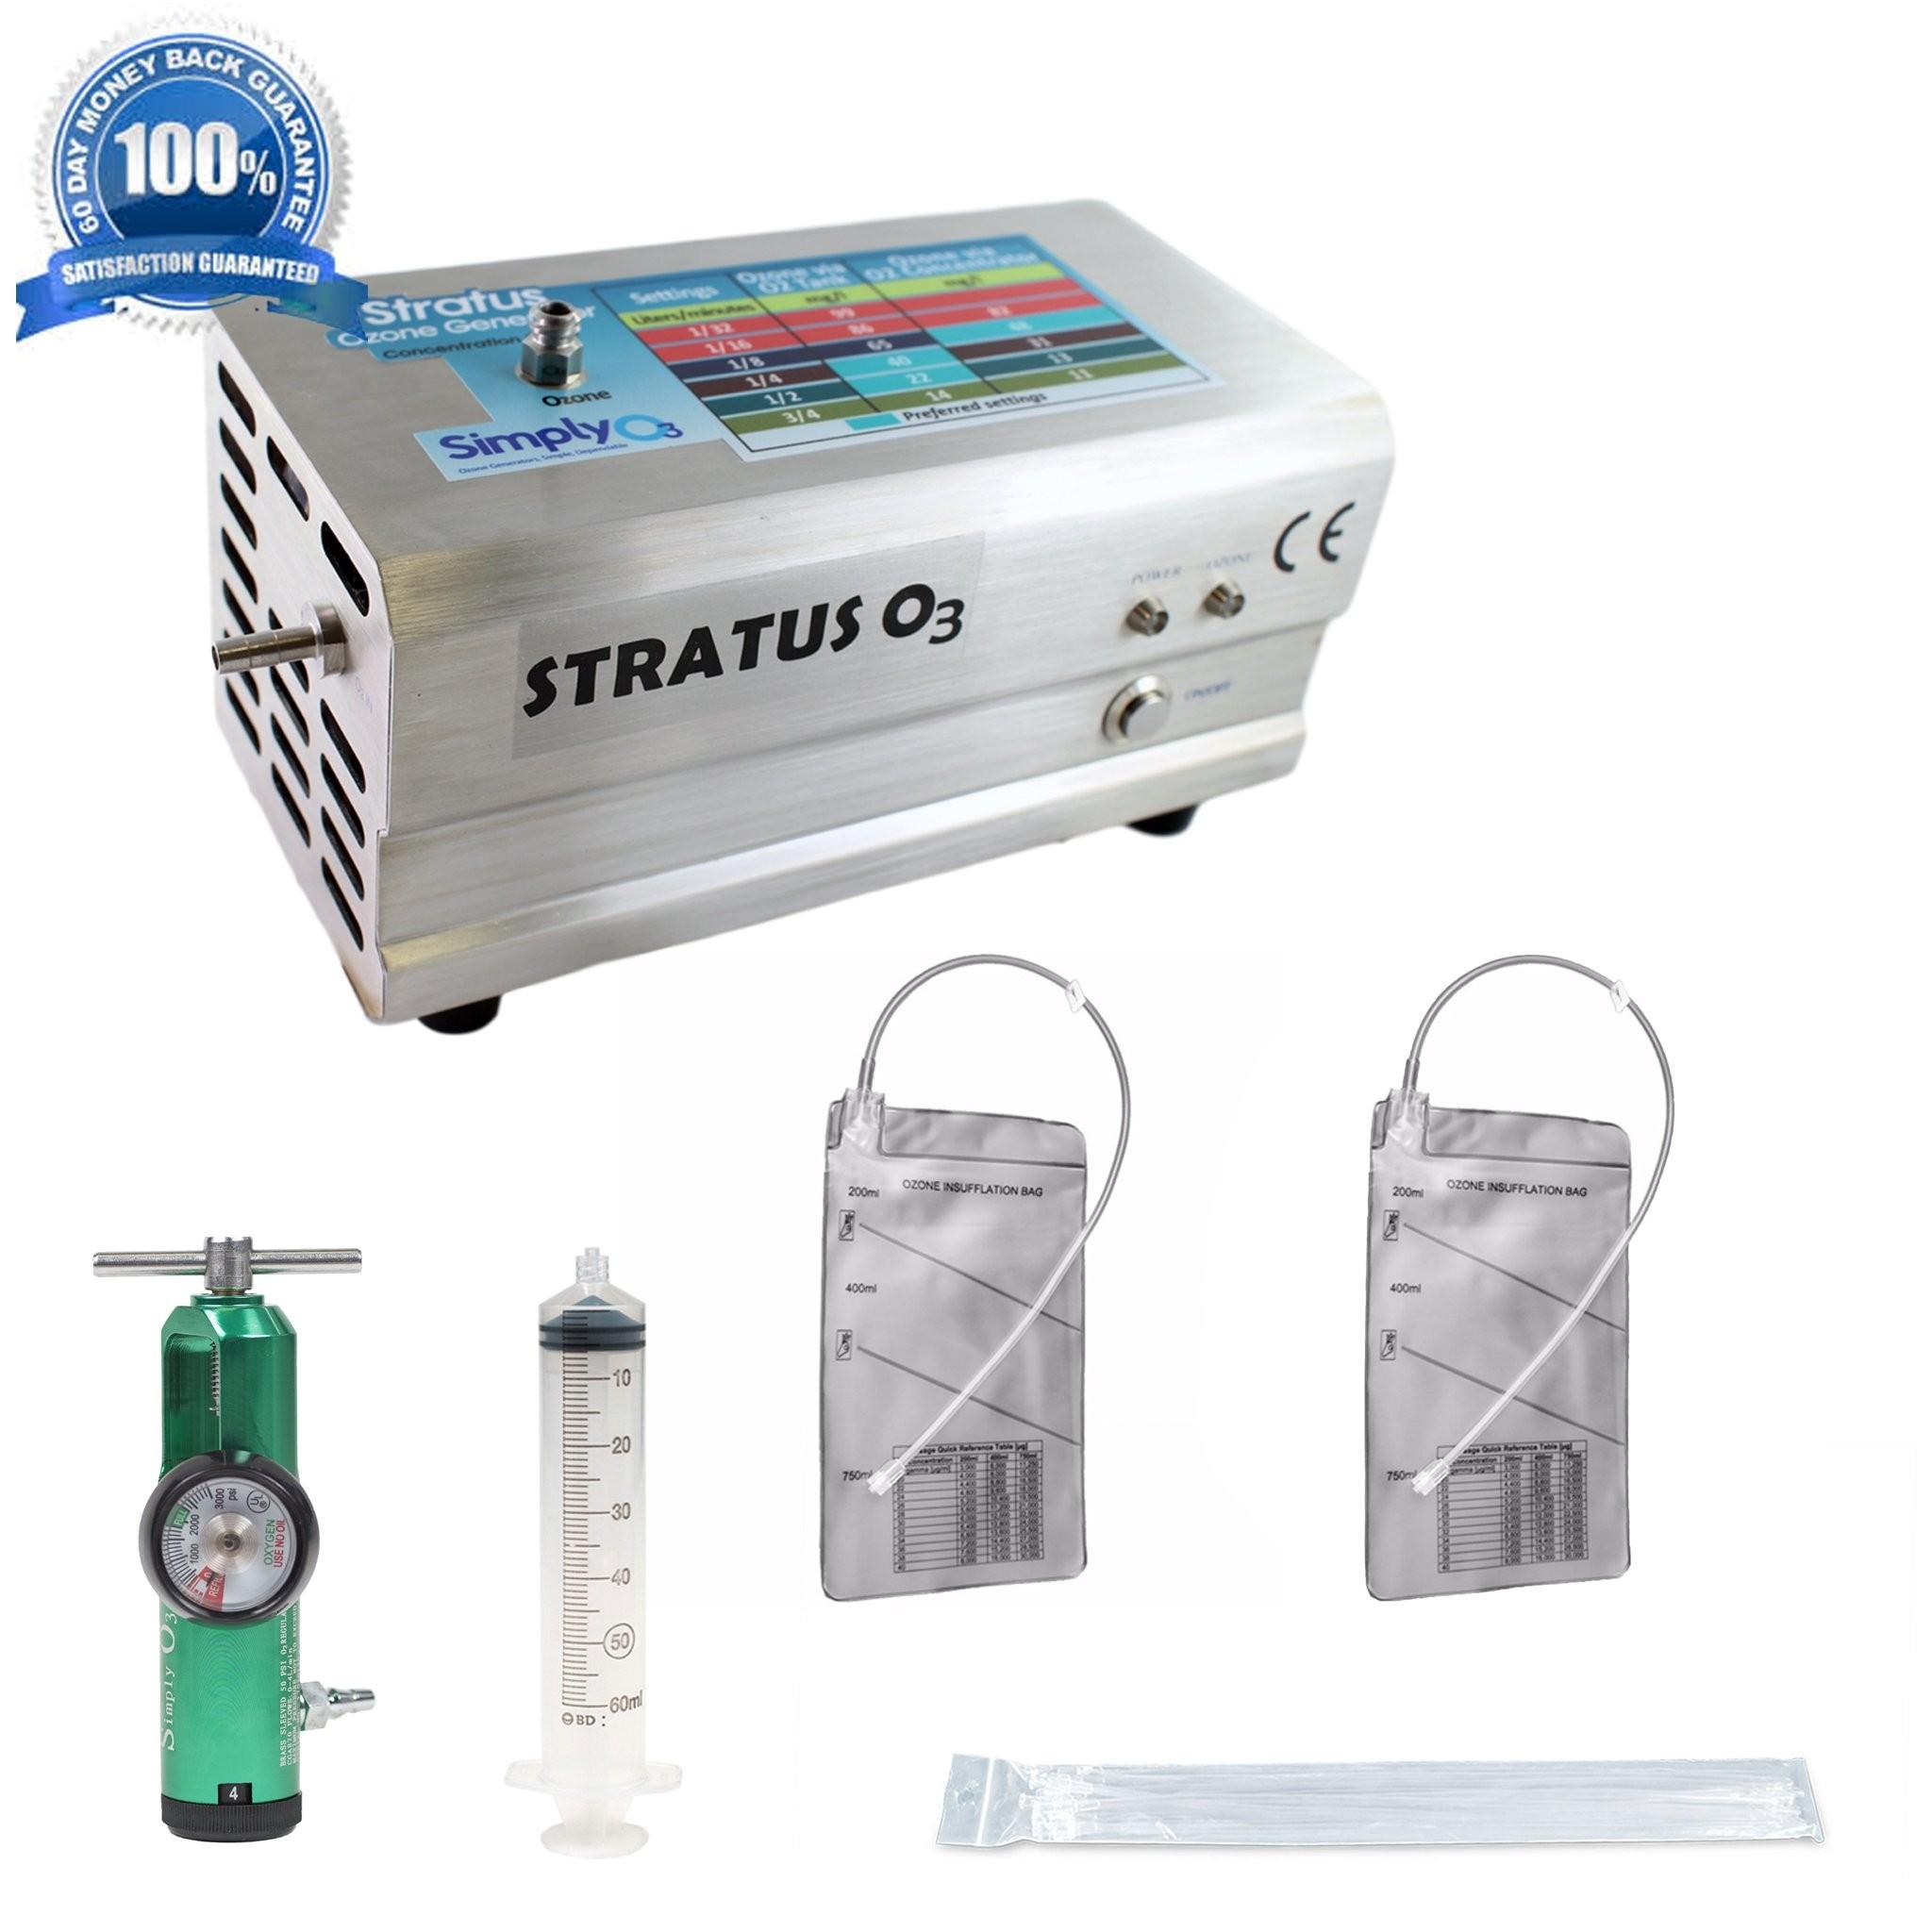 Stratus 2 0 Home User Kit 2 45ab660f 4faa 461c b044 6c b81cf